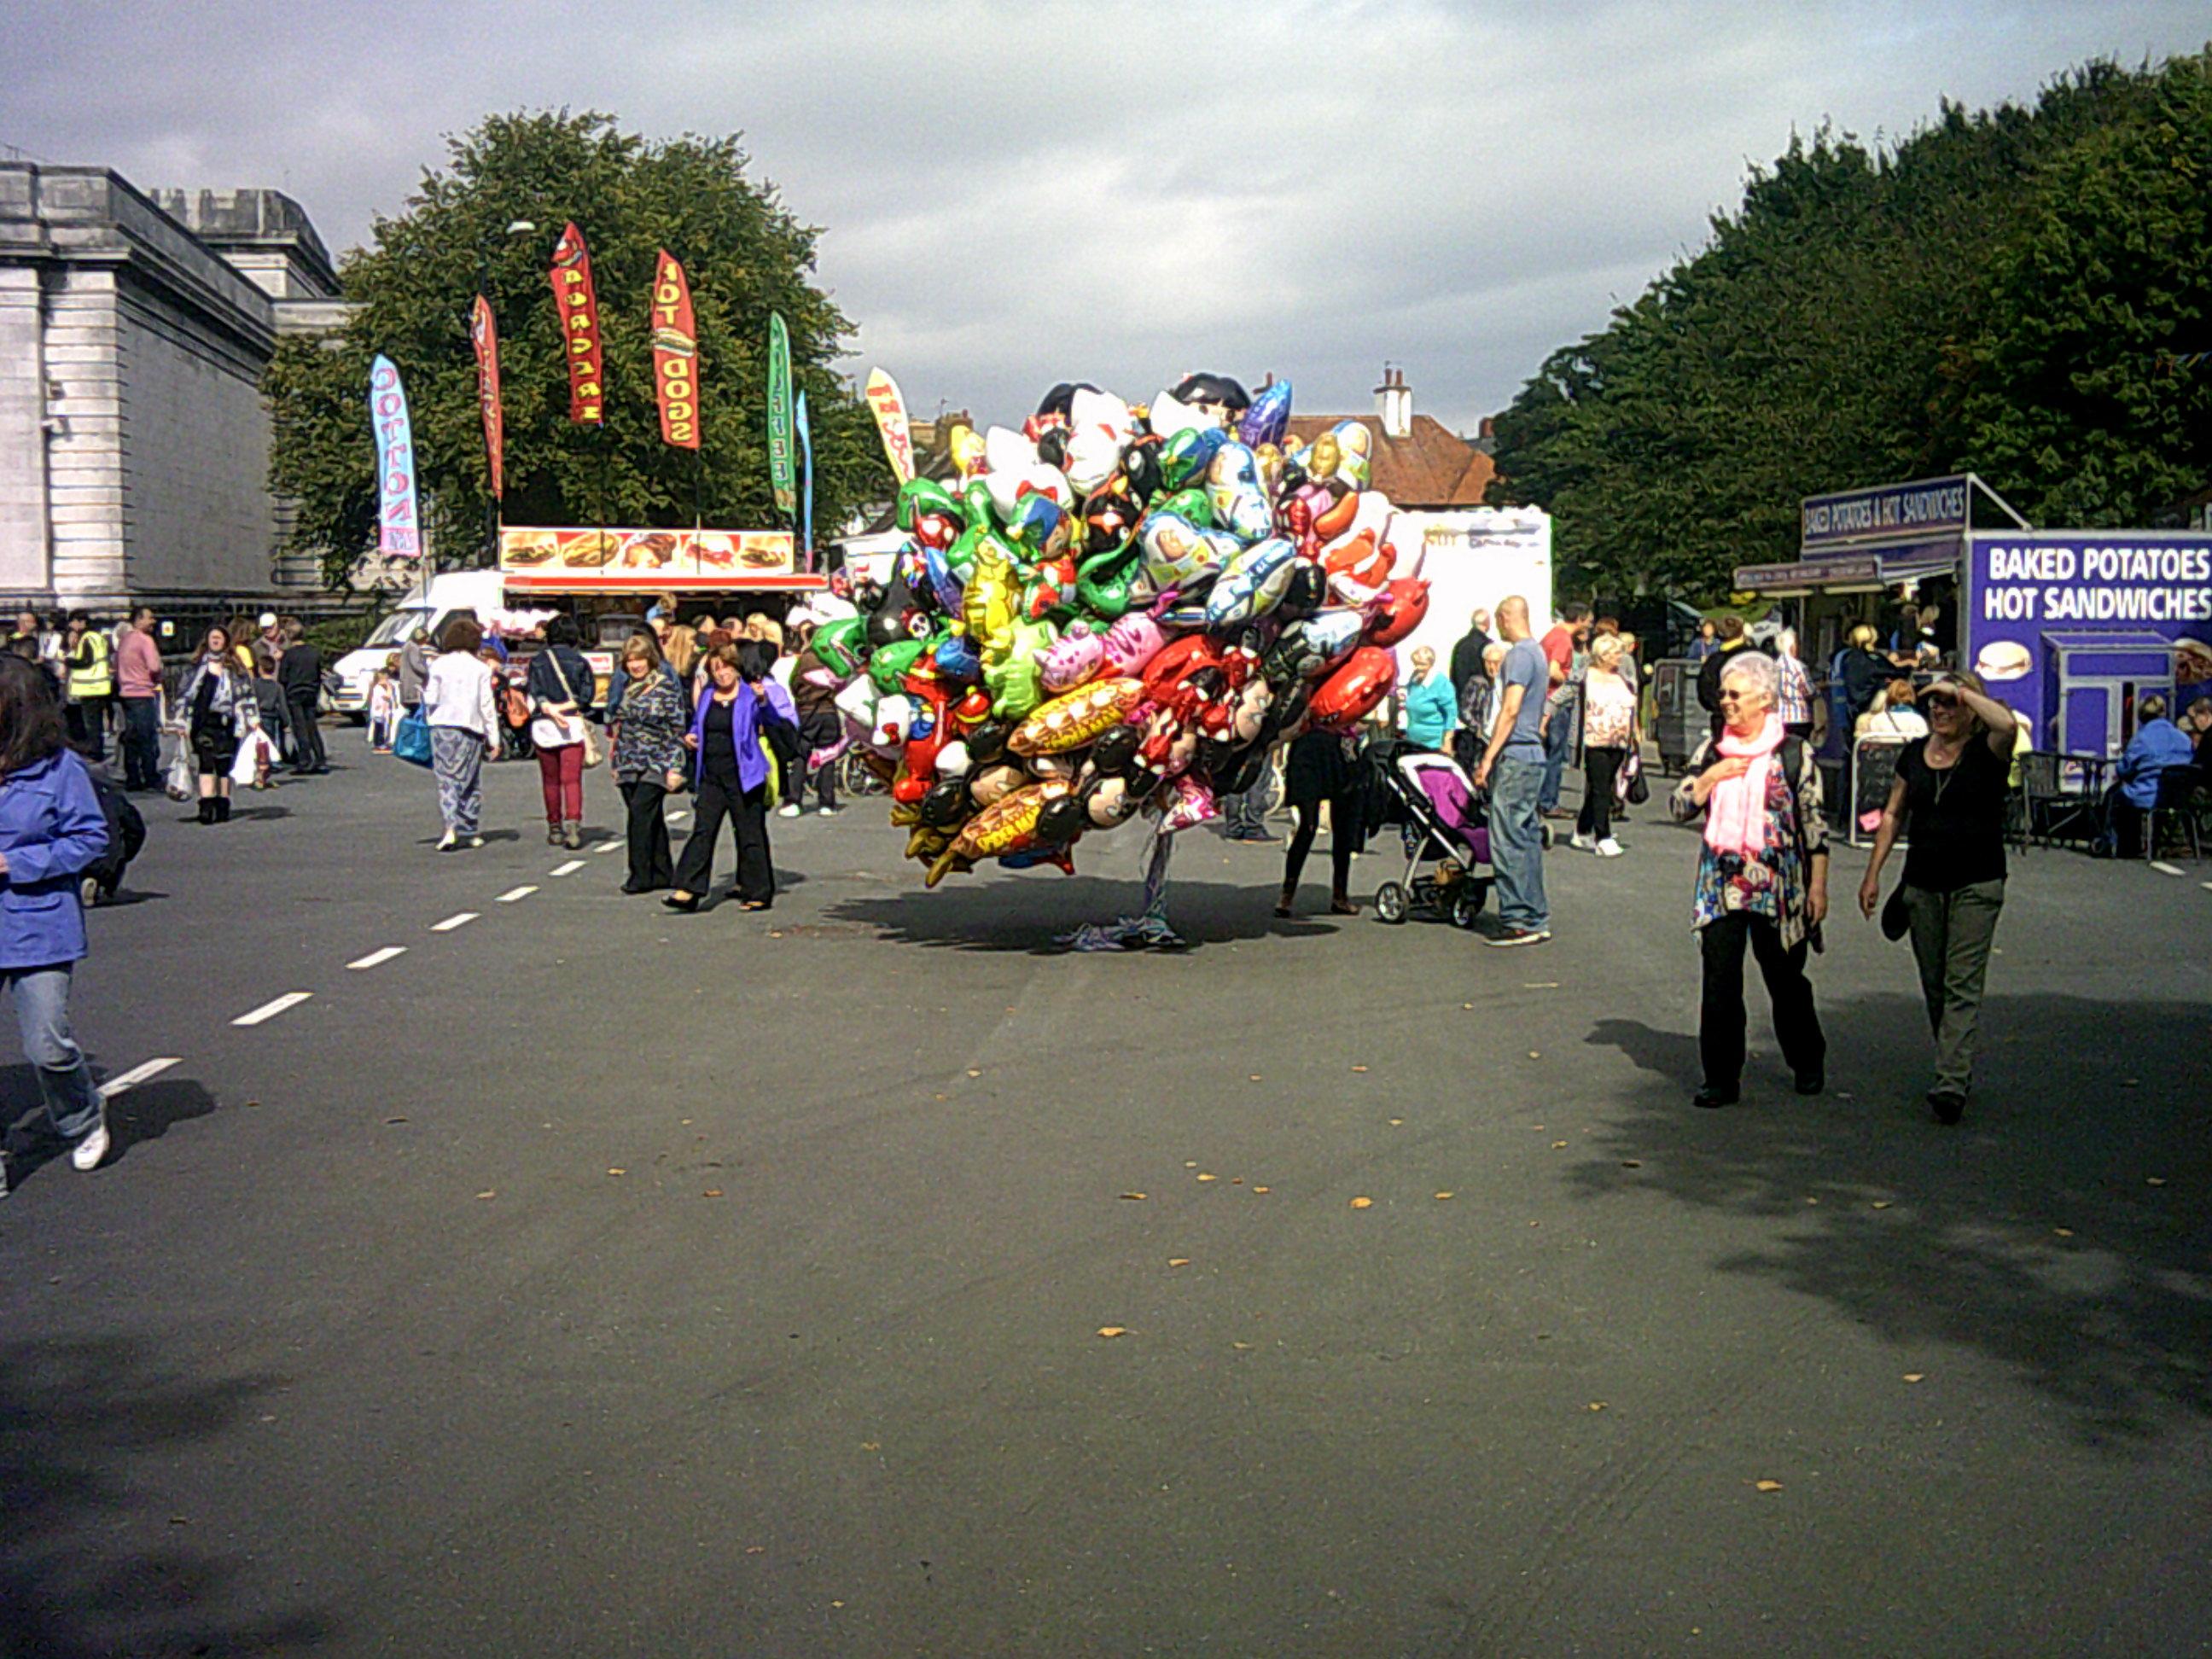 Port Sunlight Food Festival